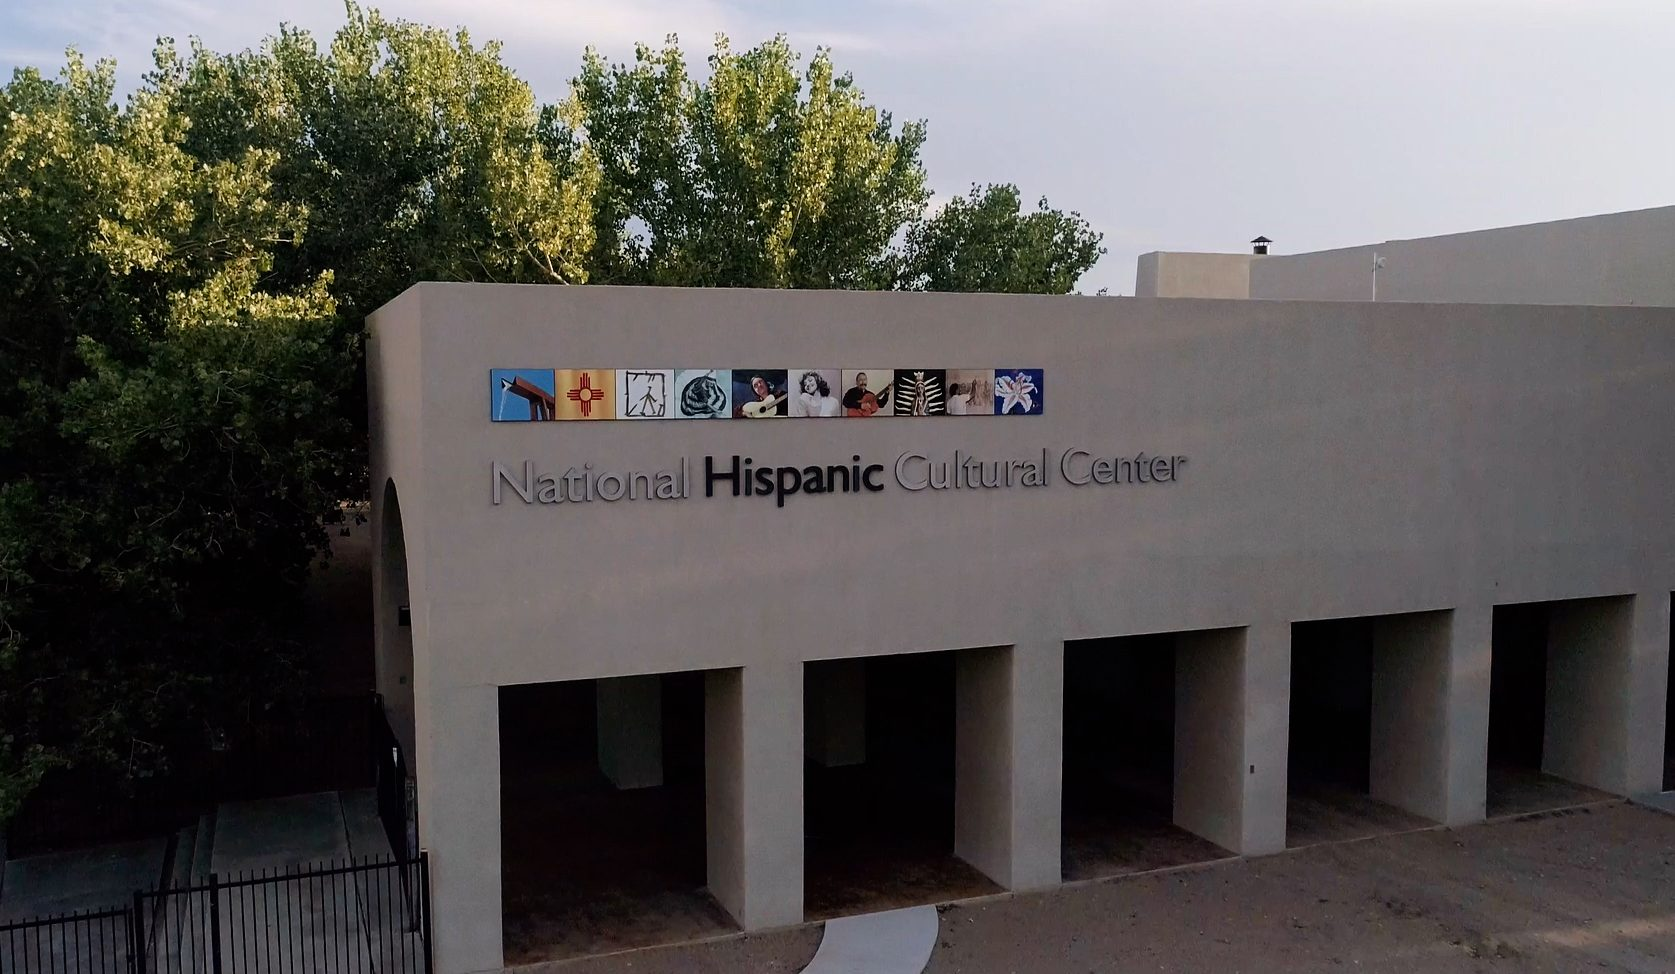 Hispanic Cultural Center